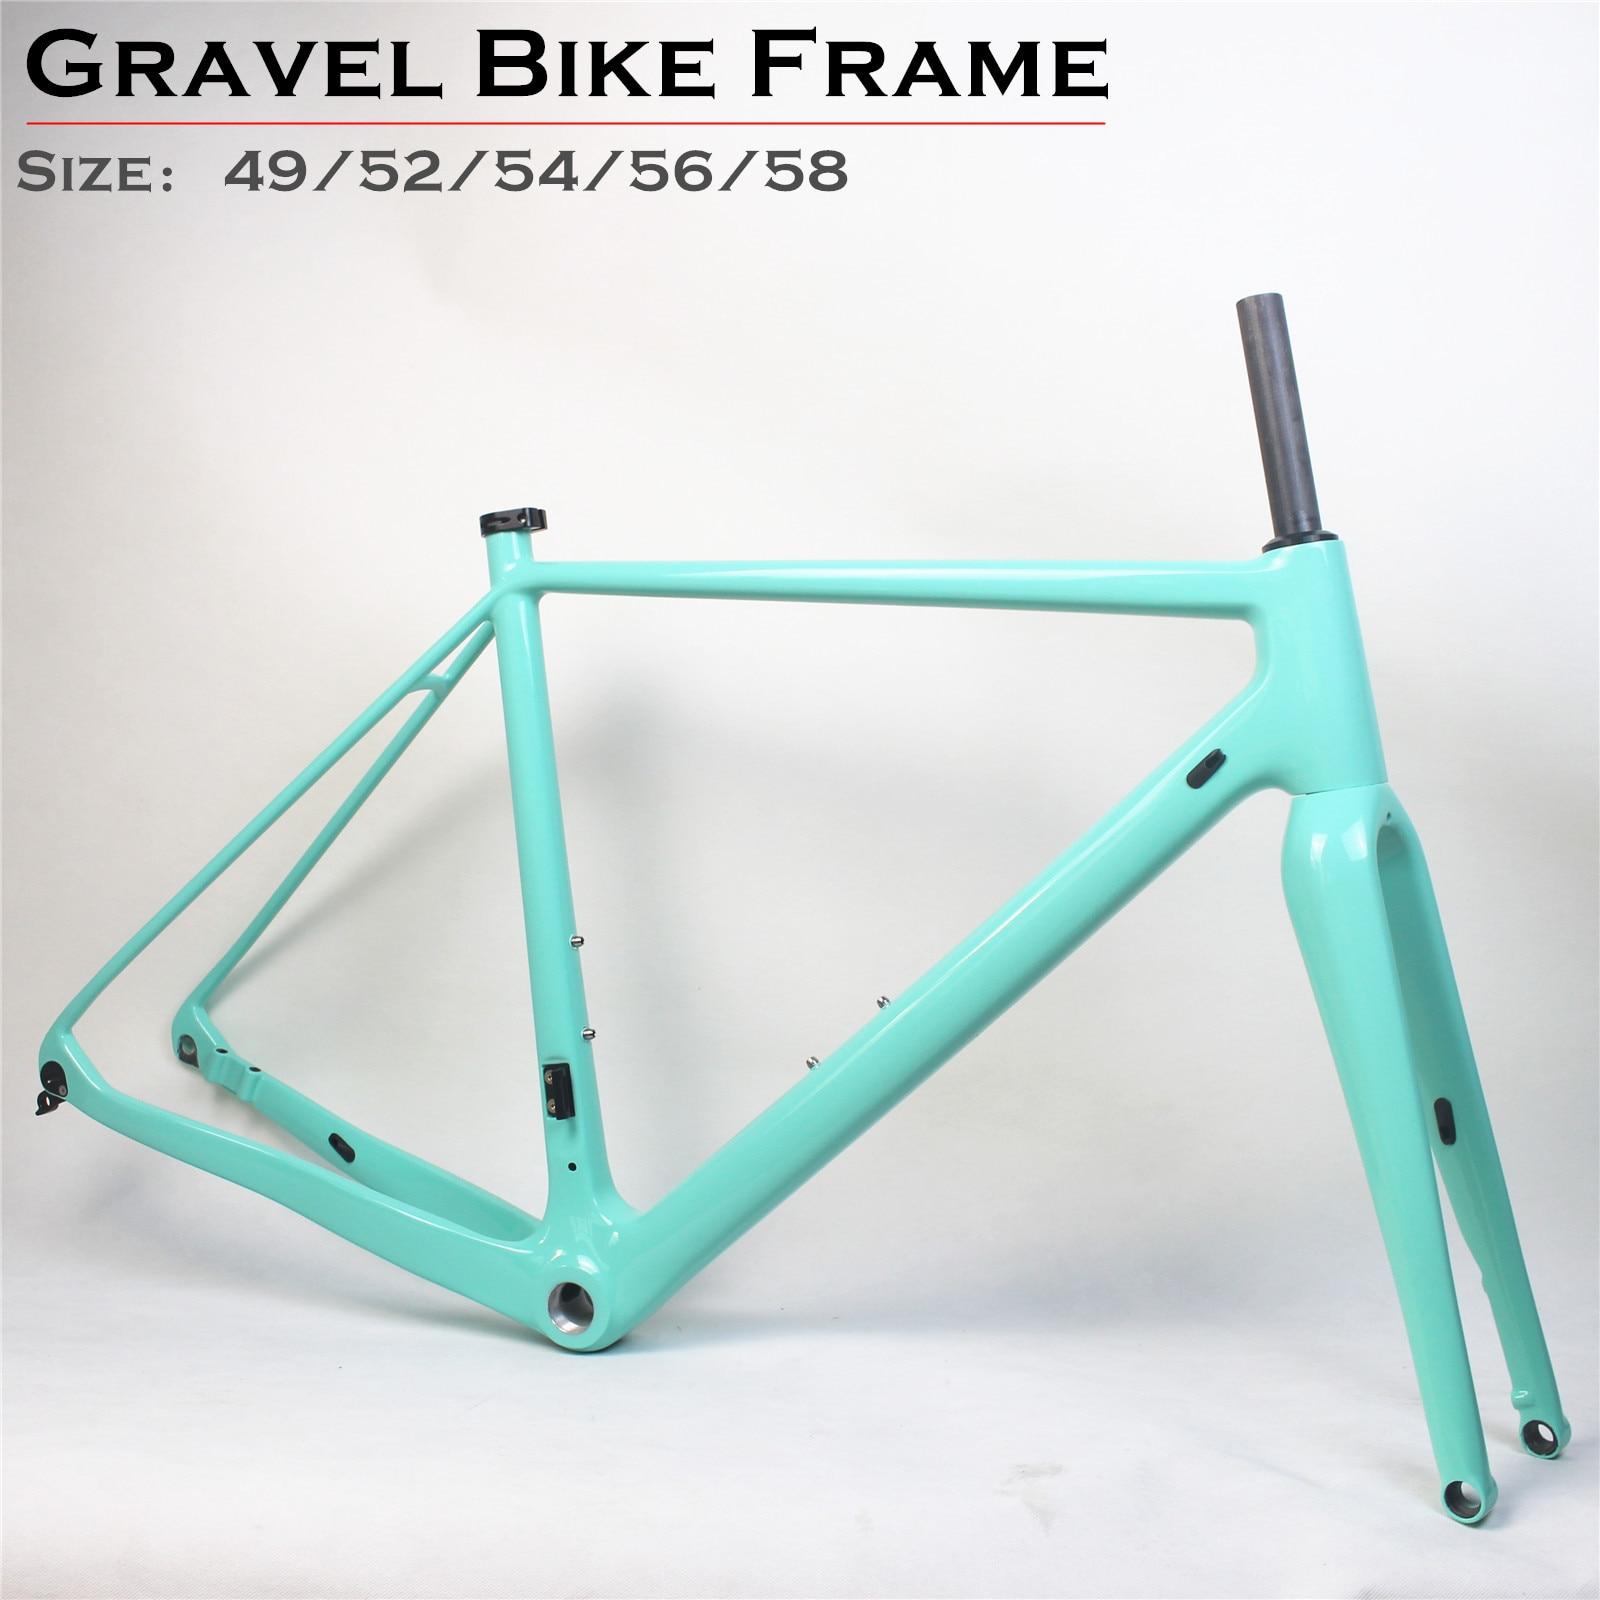 Carbono Cyclocross bicicleta marco CX plana montaje disco bicicleta estructura ciclocrós Estructura de discos con a través de Axle142 * 12 grava bicicleta